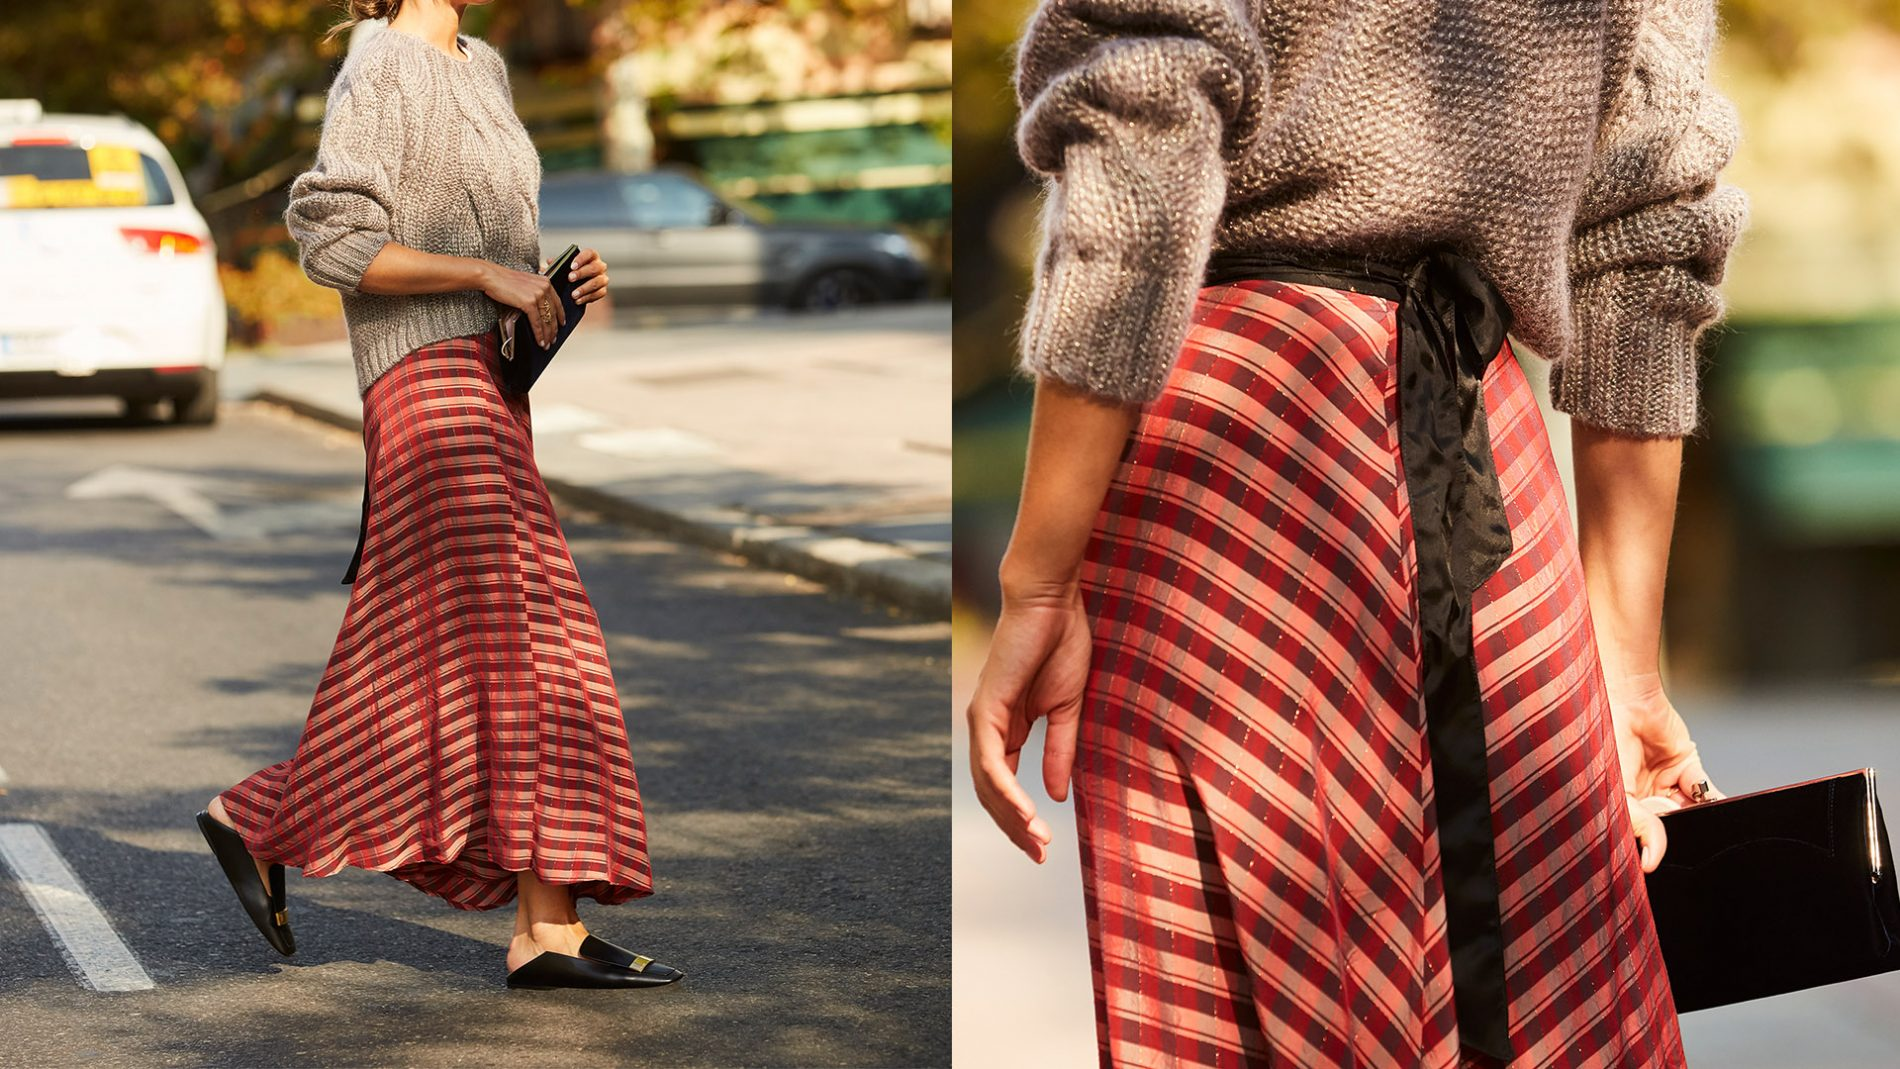 El Corte Inglés Ready-To-Wear Shoes Handbags forte_forte Sergio Rossi Victoria Beckham